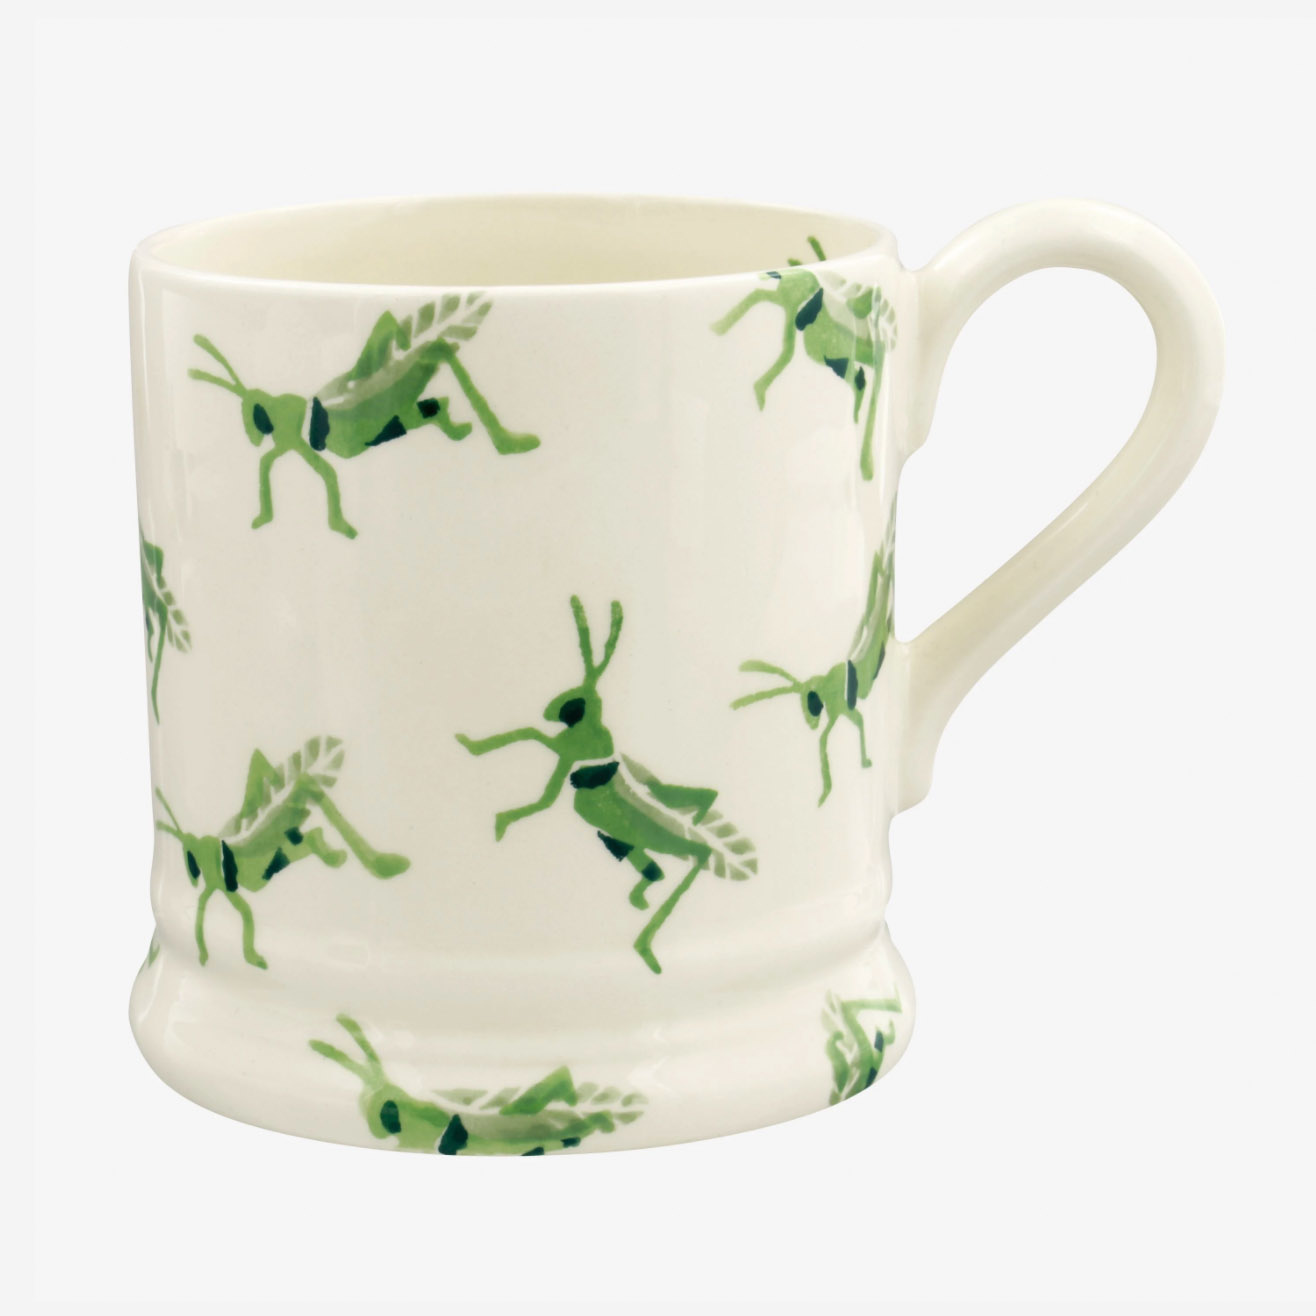 Insects Grasshopper - 1/2 Pint Mug-1